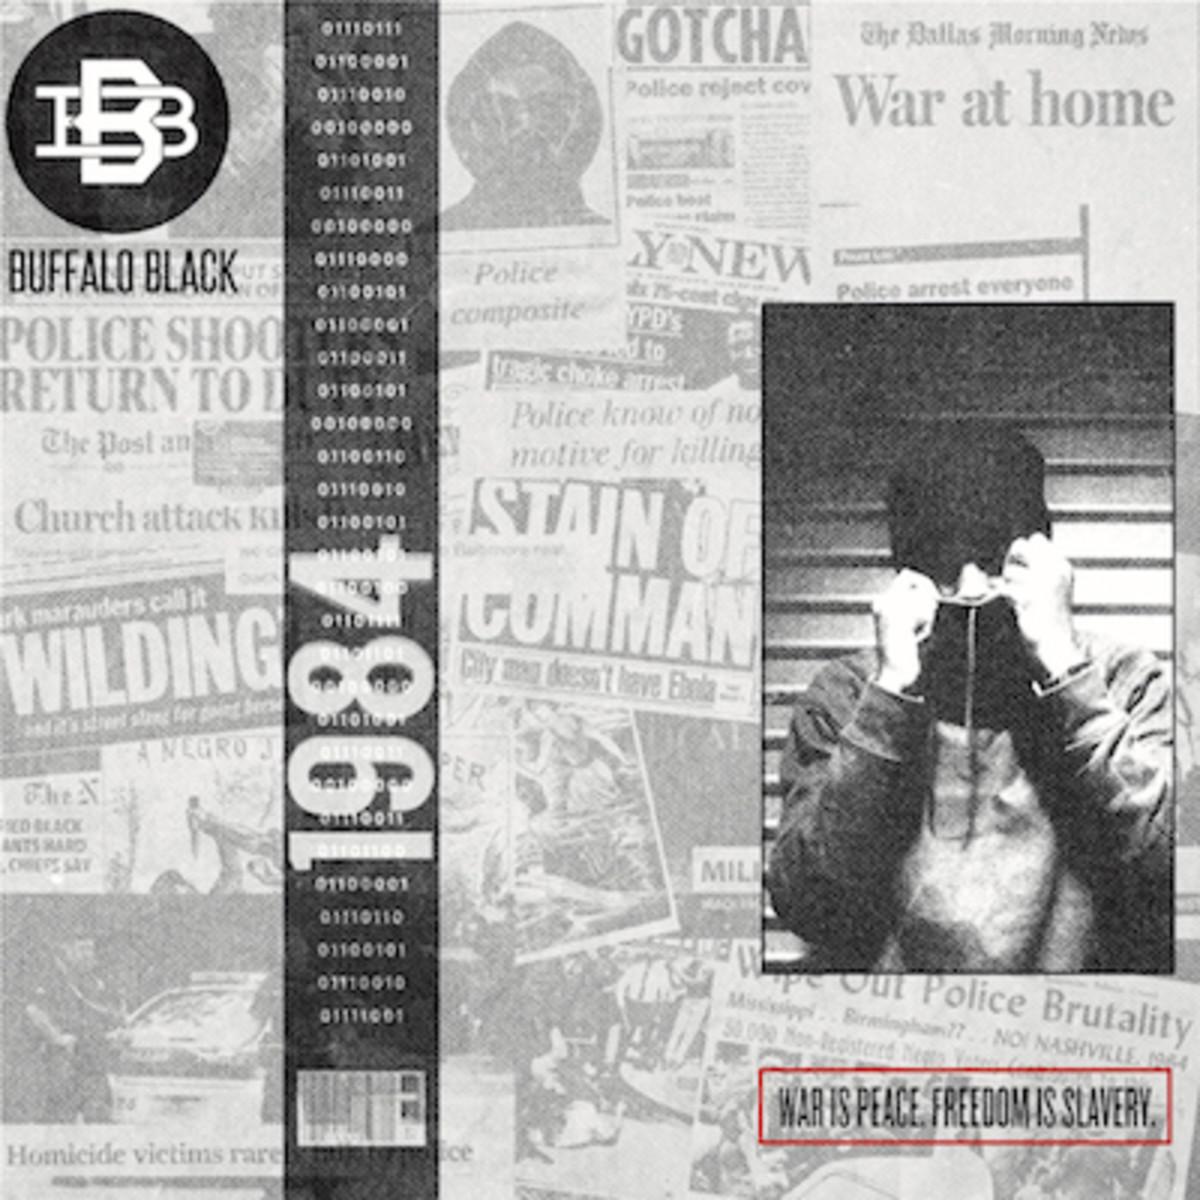 buffalo-black-1984.jpg